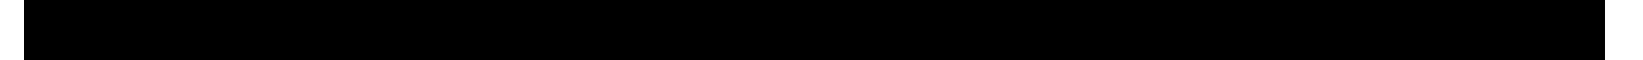 Perevozkin